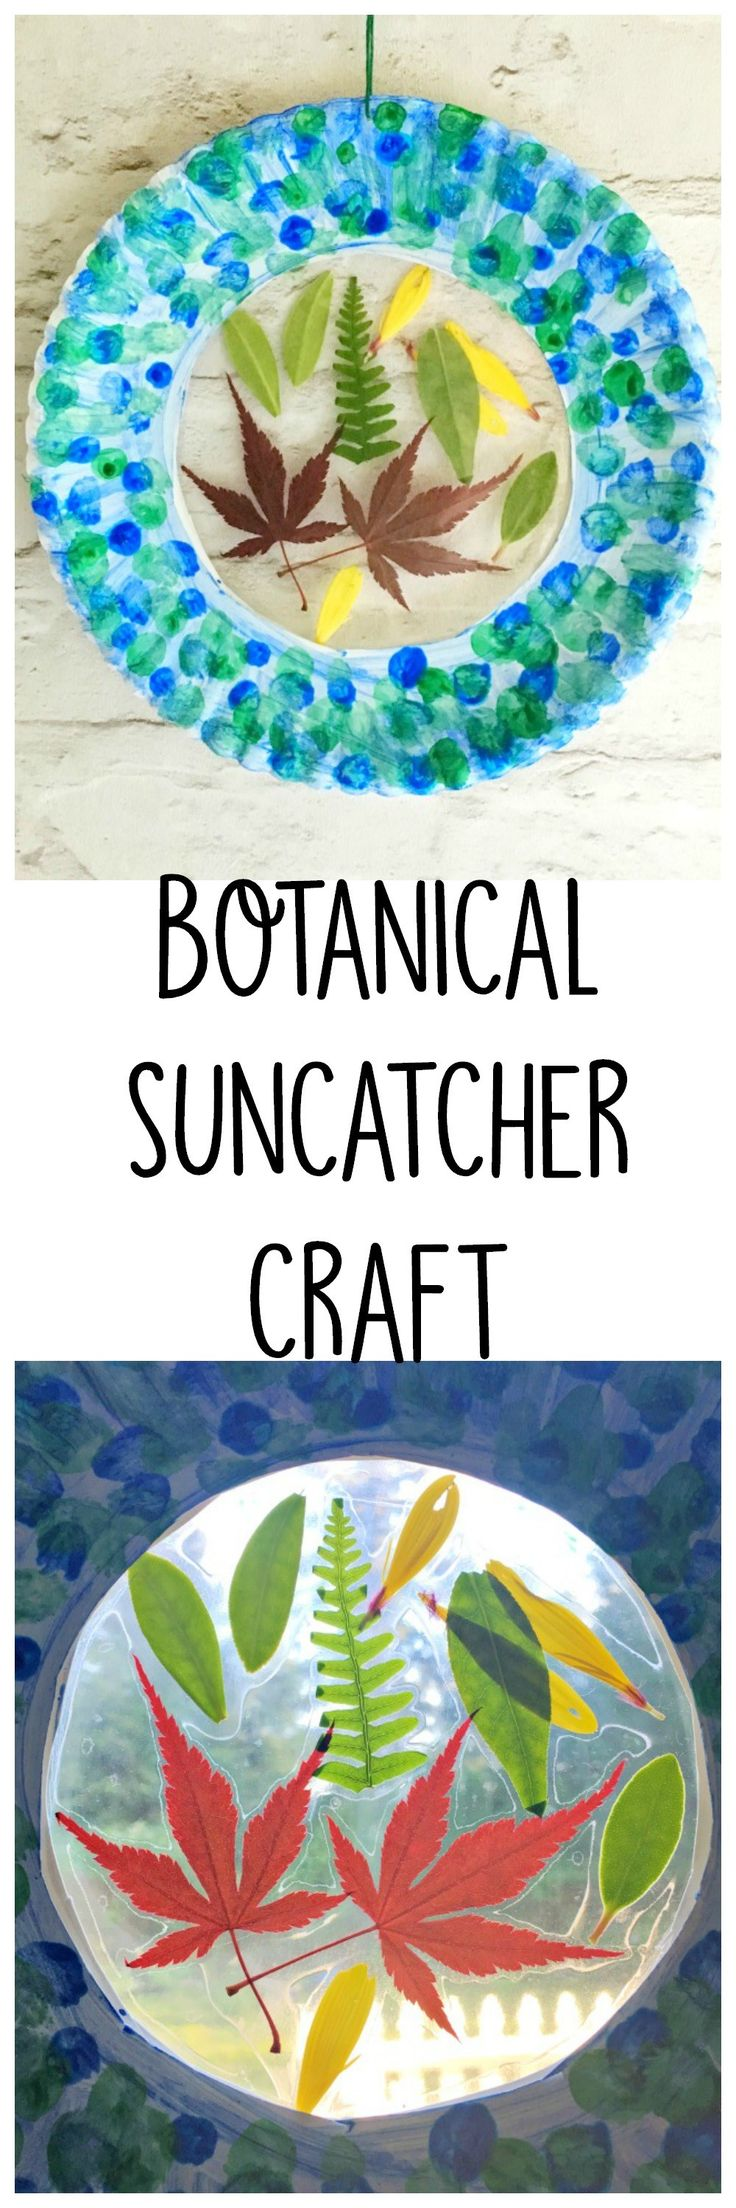 Botanical Sun catcher Craft for Kids - Crafty Little Gnome